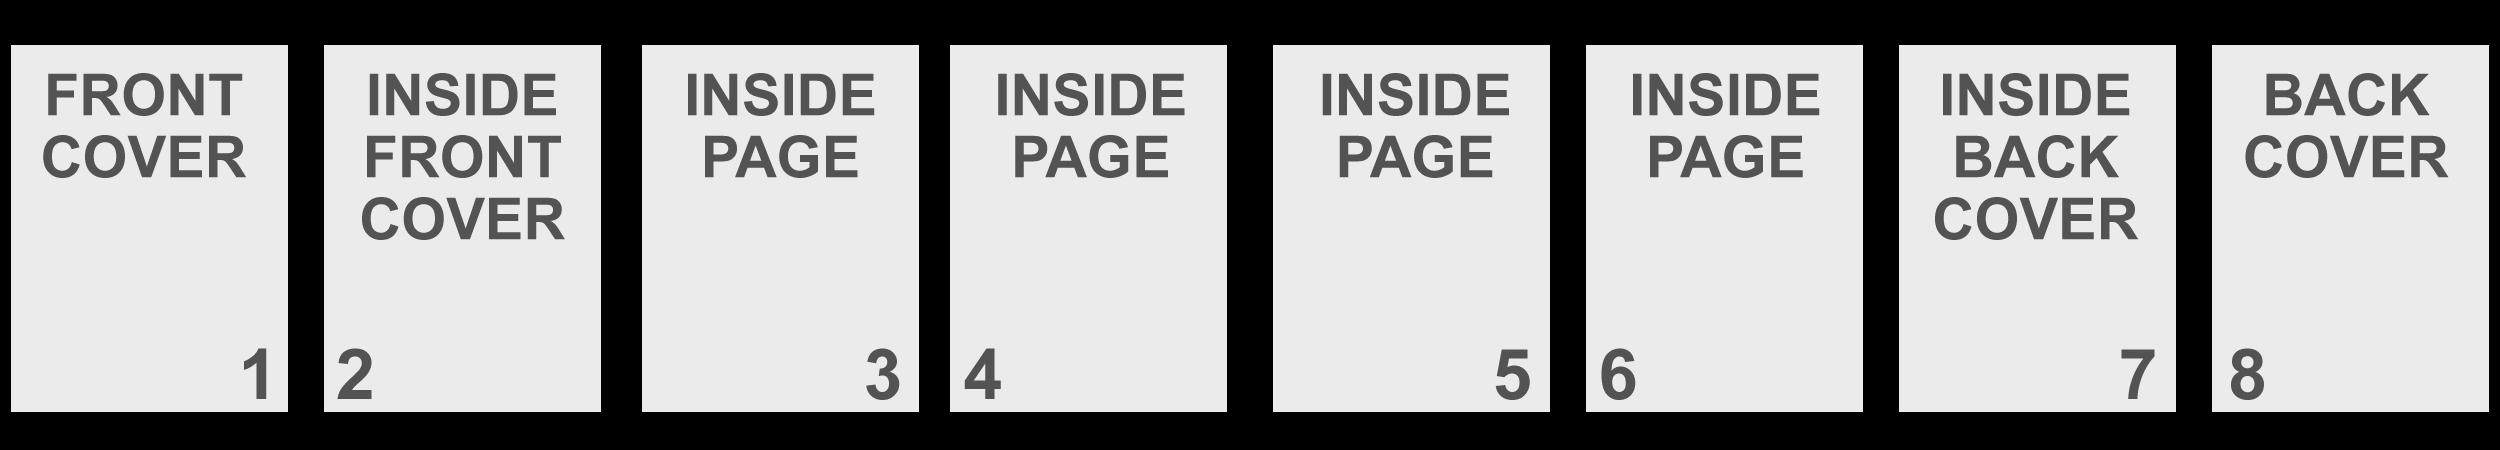 Page Order PrintingCenterUSA